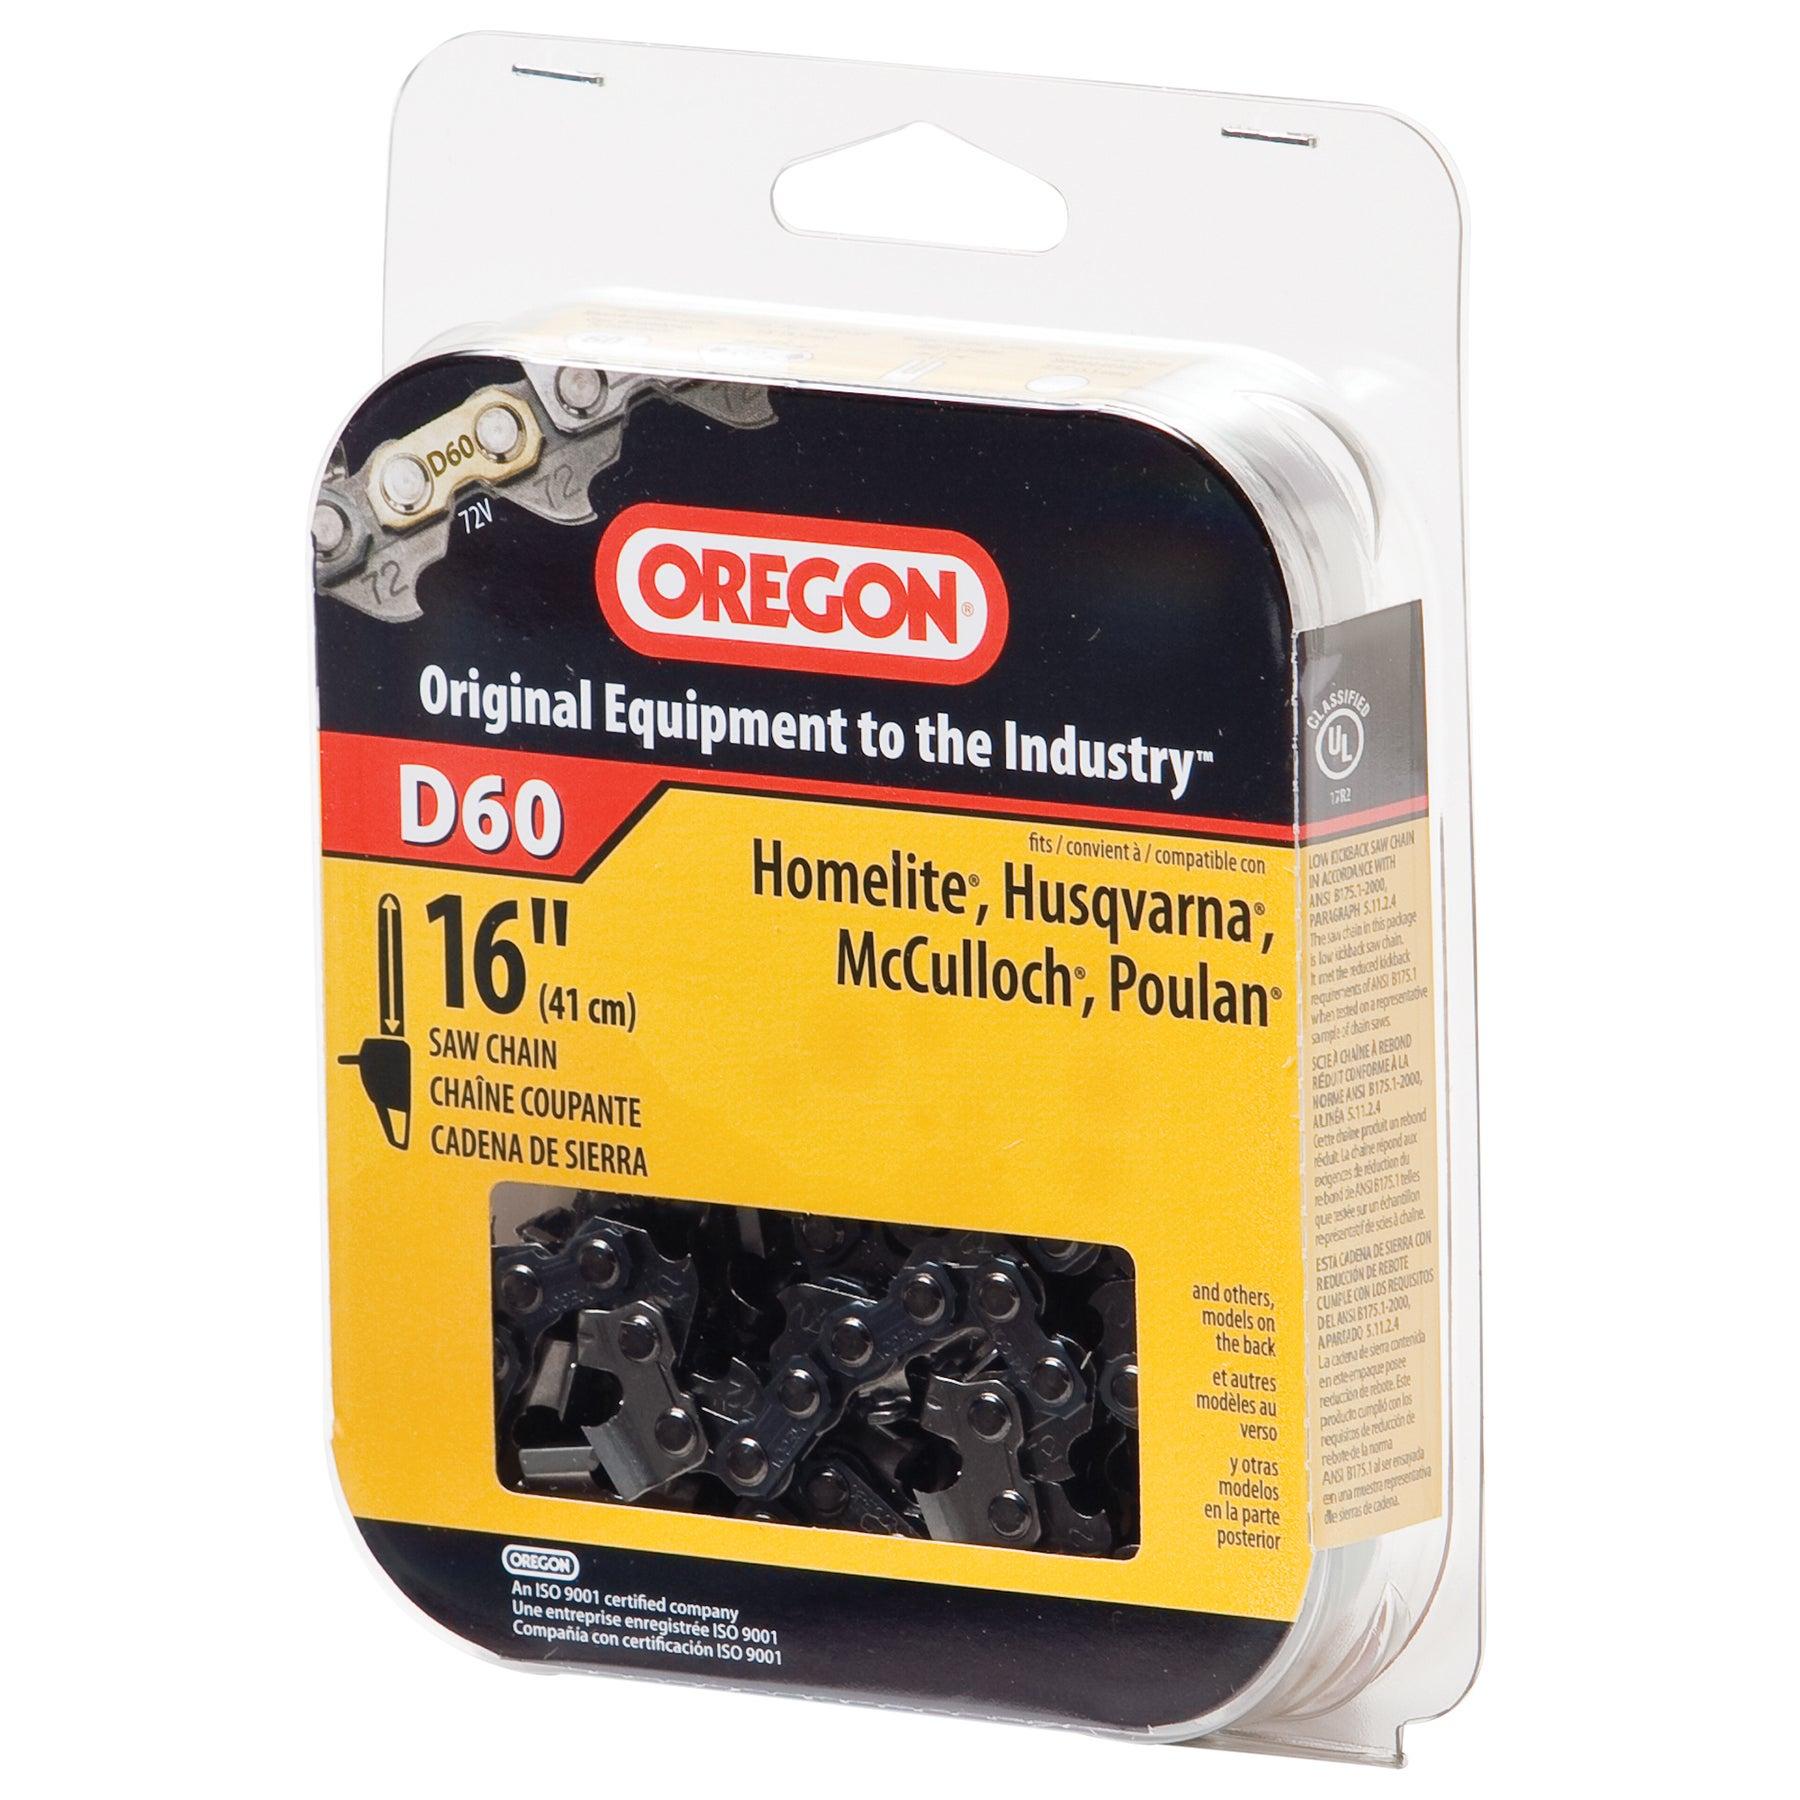 "Oregon D60 16"" Full Chisel Cutting Chain (Saws/sawblades)..."